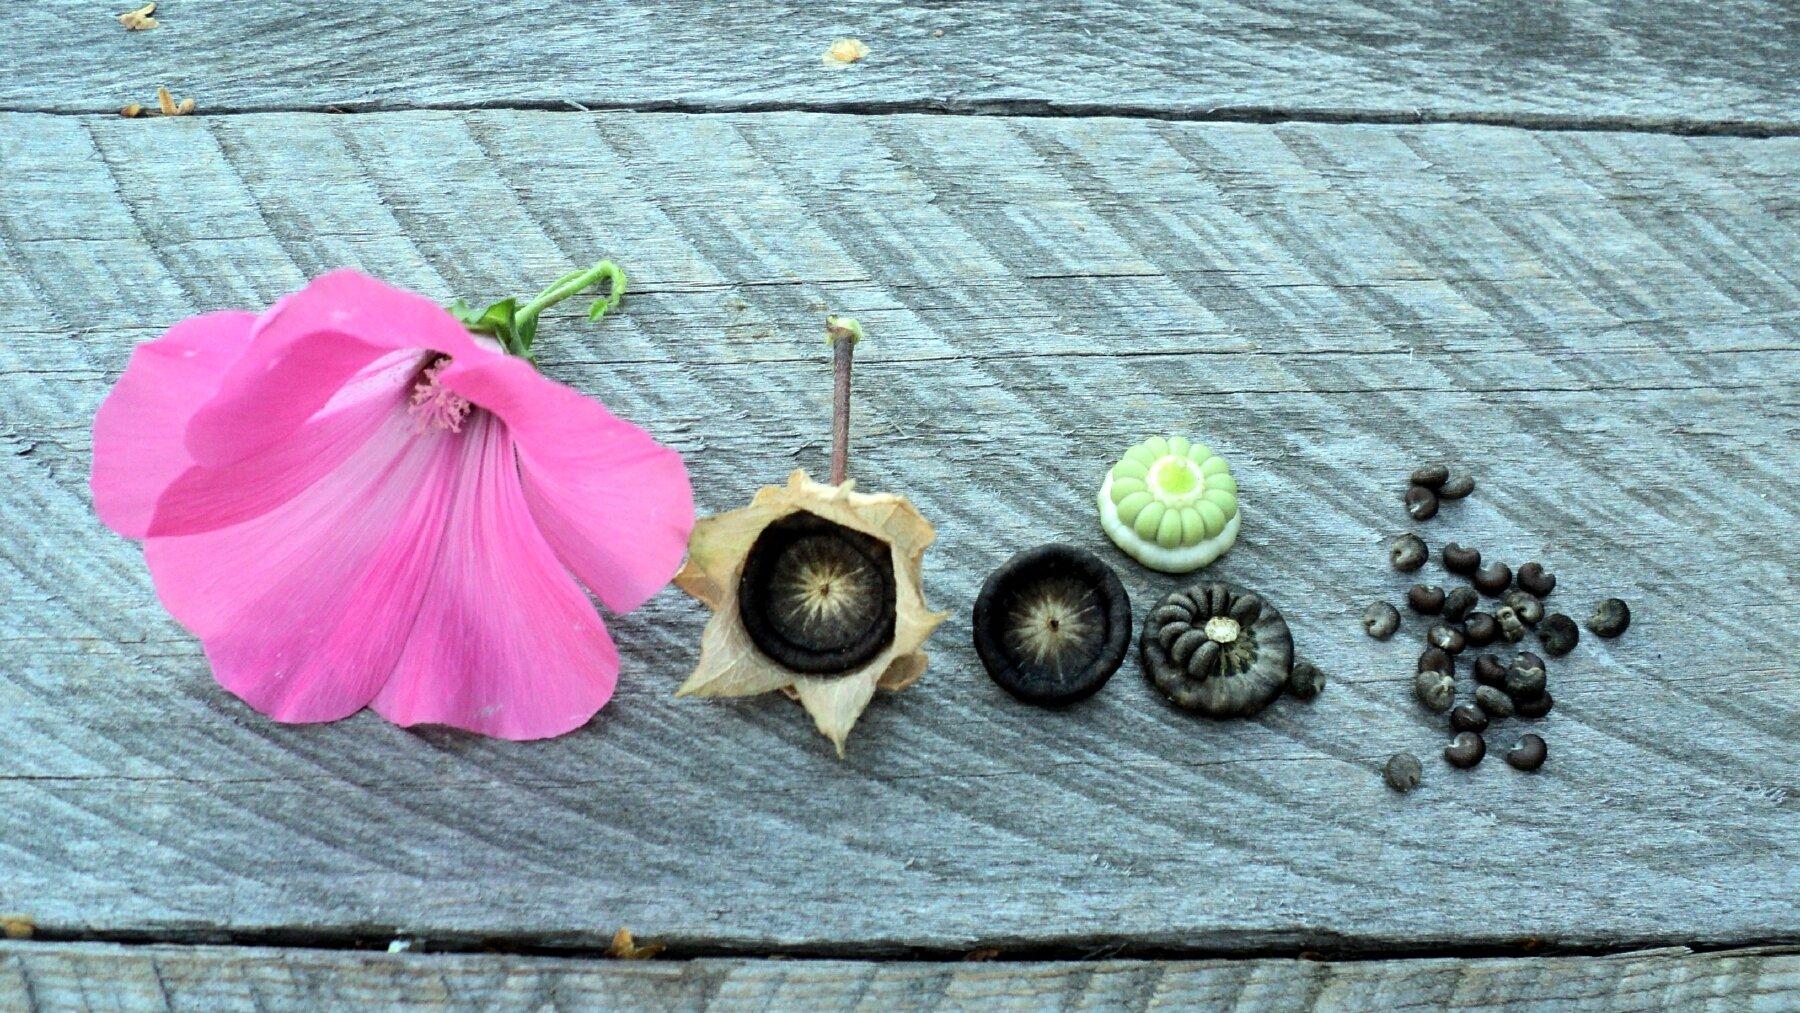 Фото семян лаватеры